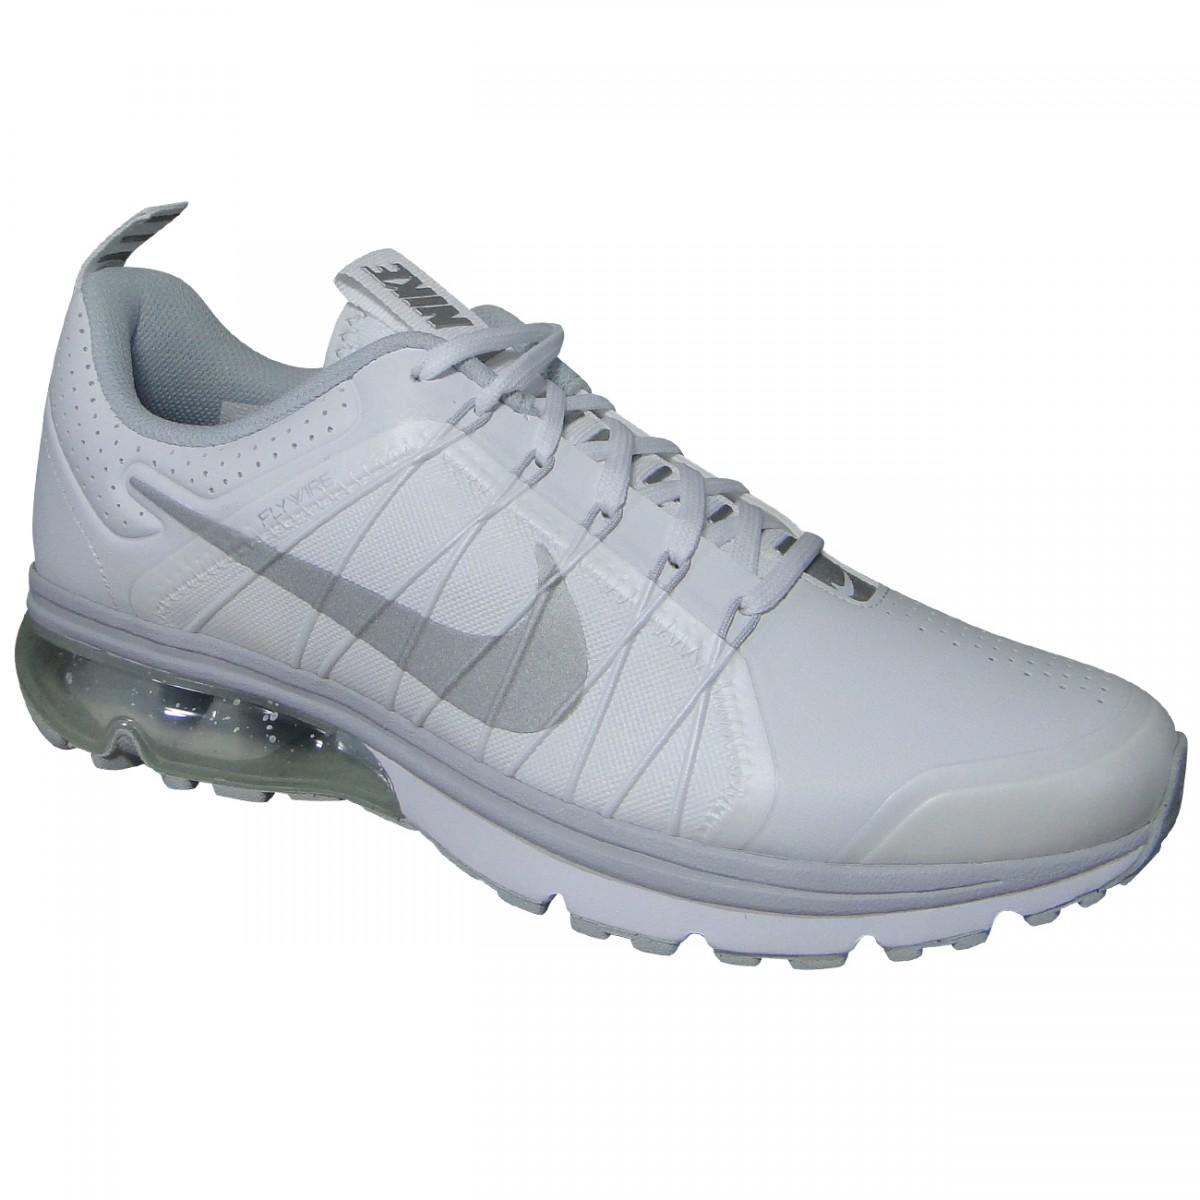 meet 851e8 adf1b Tenis Nike Air Max Supreme 4